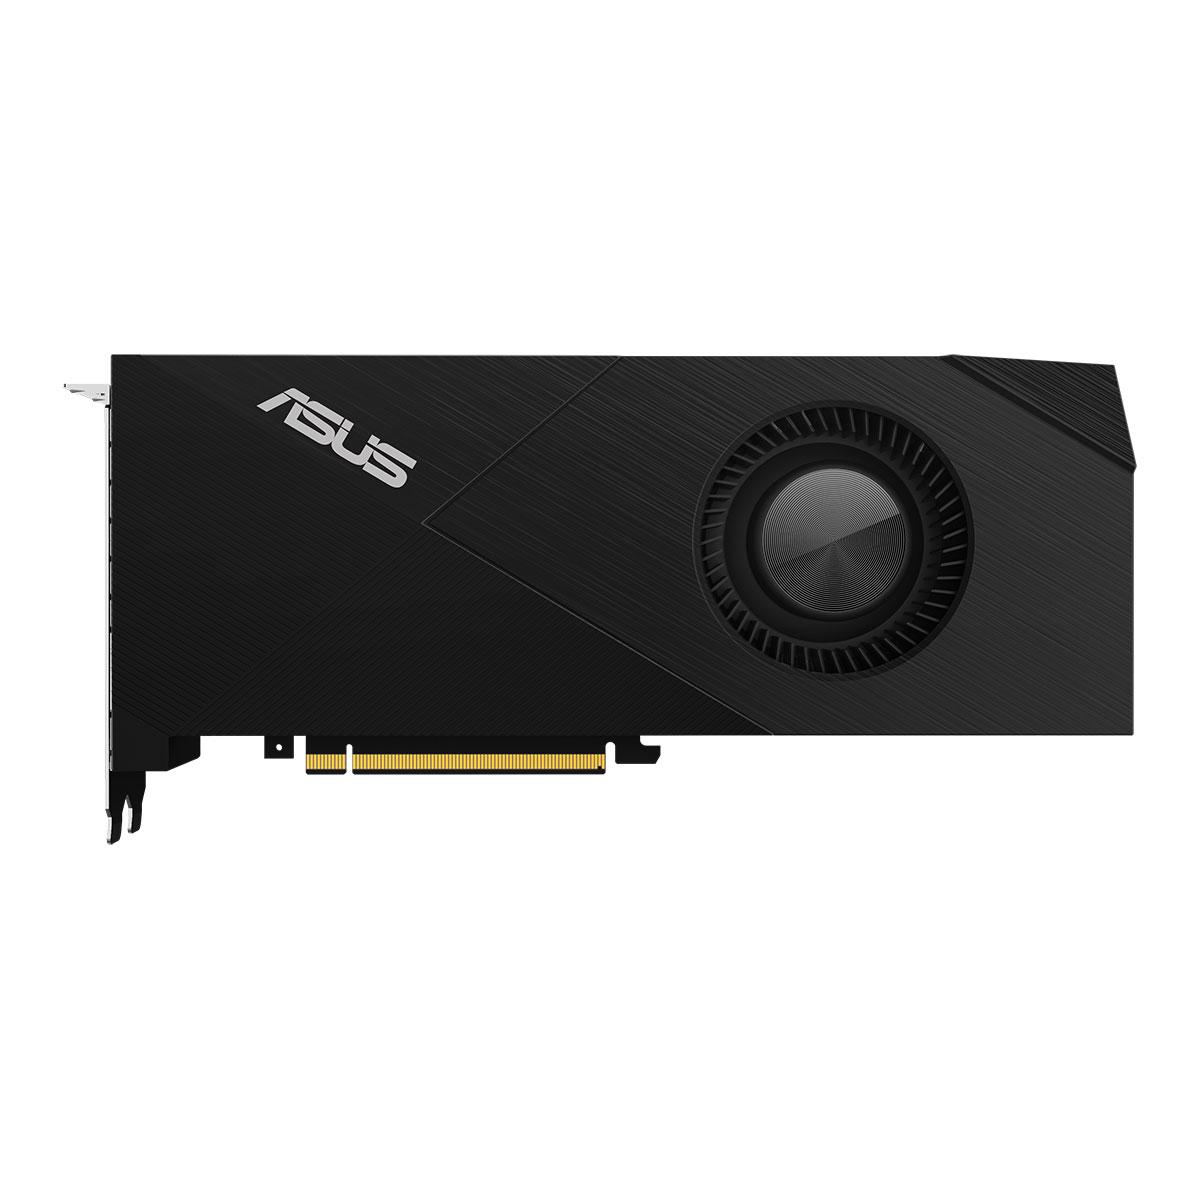 GeForce RTX 2080 Ti Turbo (90YV0C40-M0NM00) - Achat / Vente Carte graphique sur Picata.fr - 1